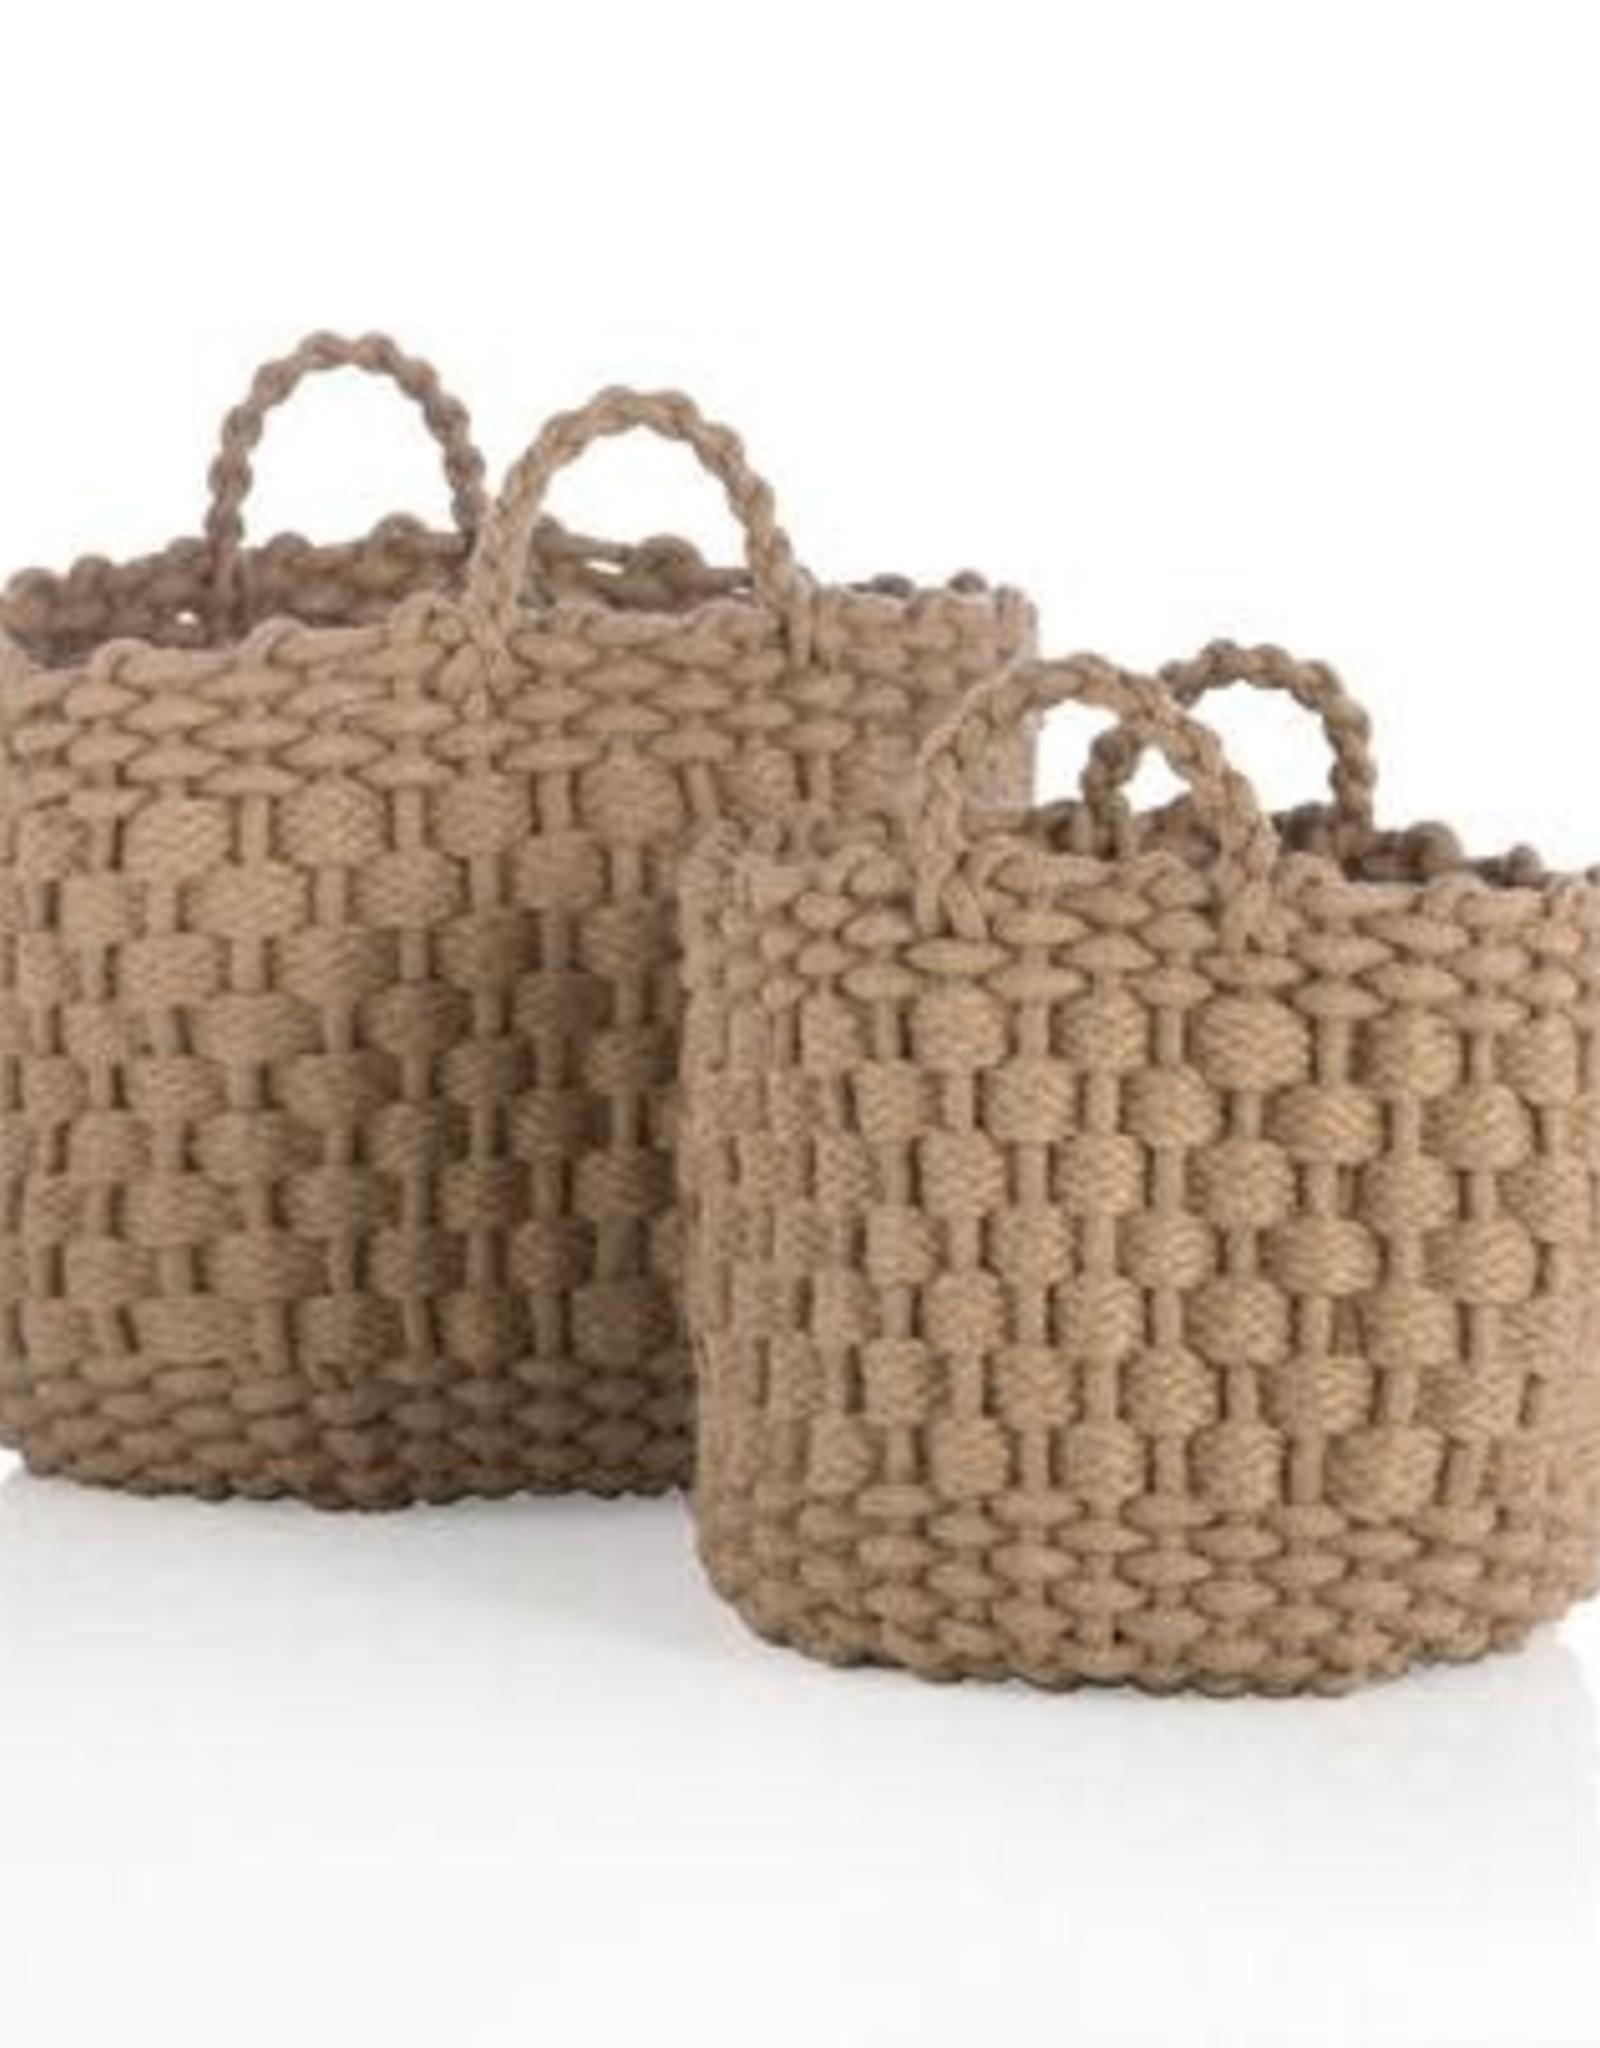 Handled Jute Basket